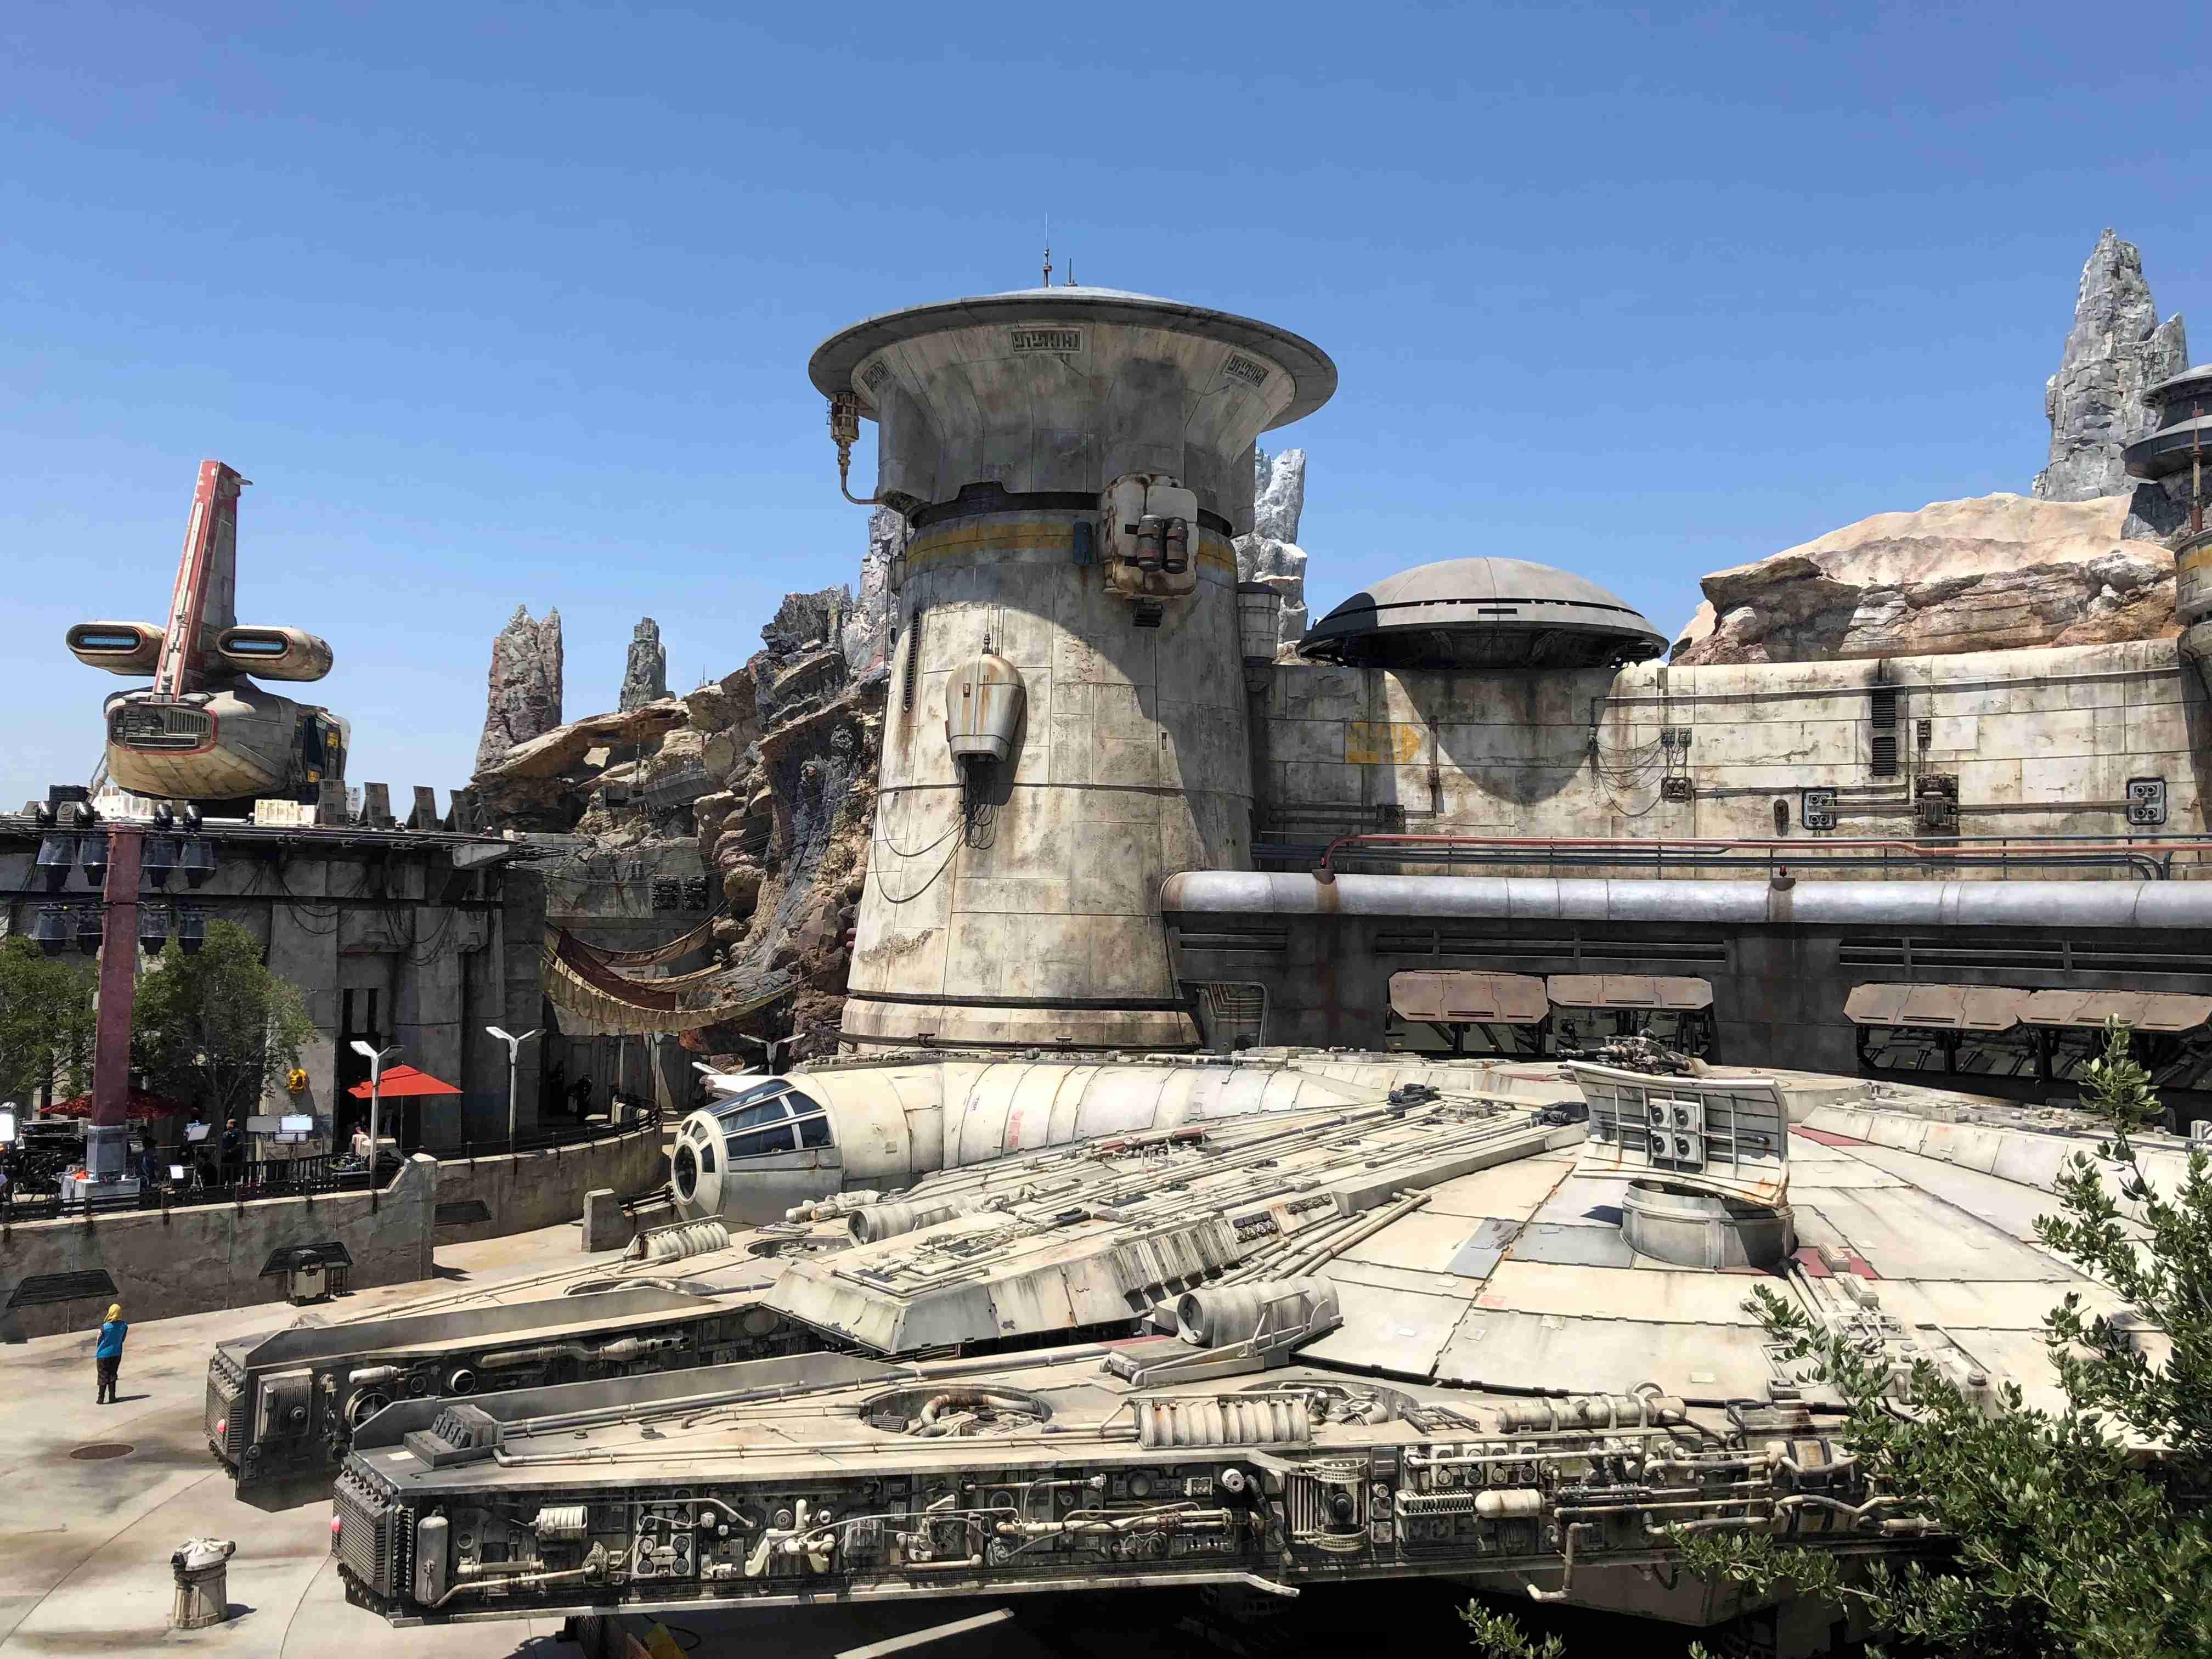 Star Wars Galaxys Edge - Millennium Falcon